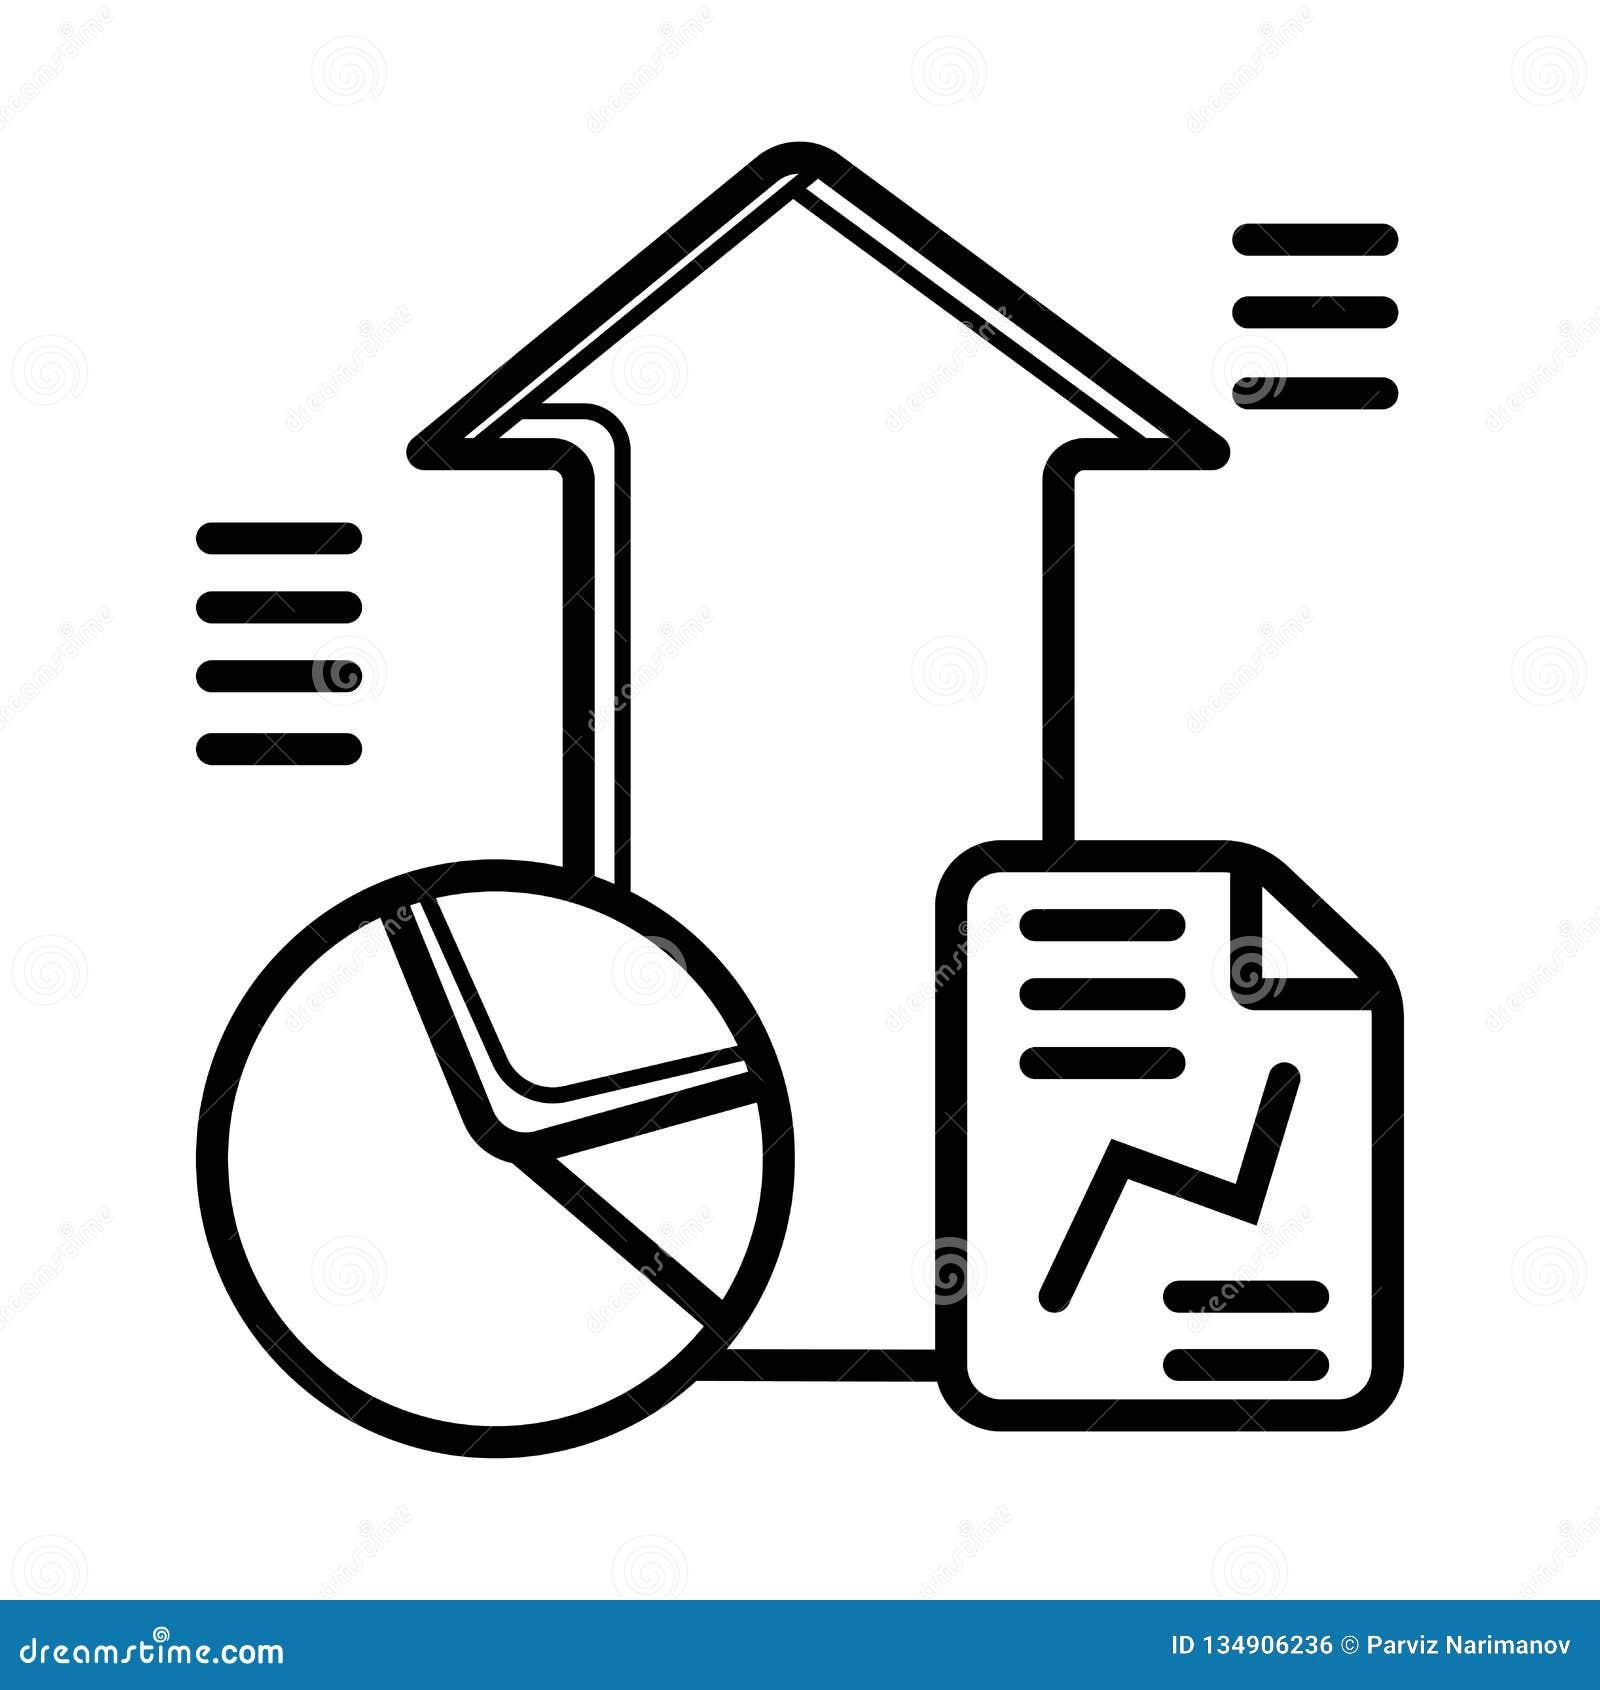 Statistics vector icon